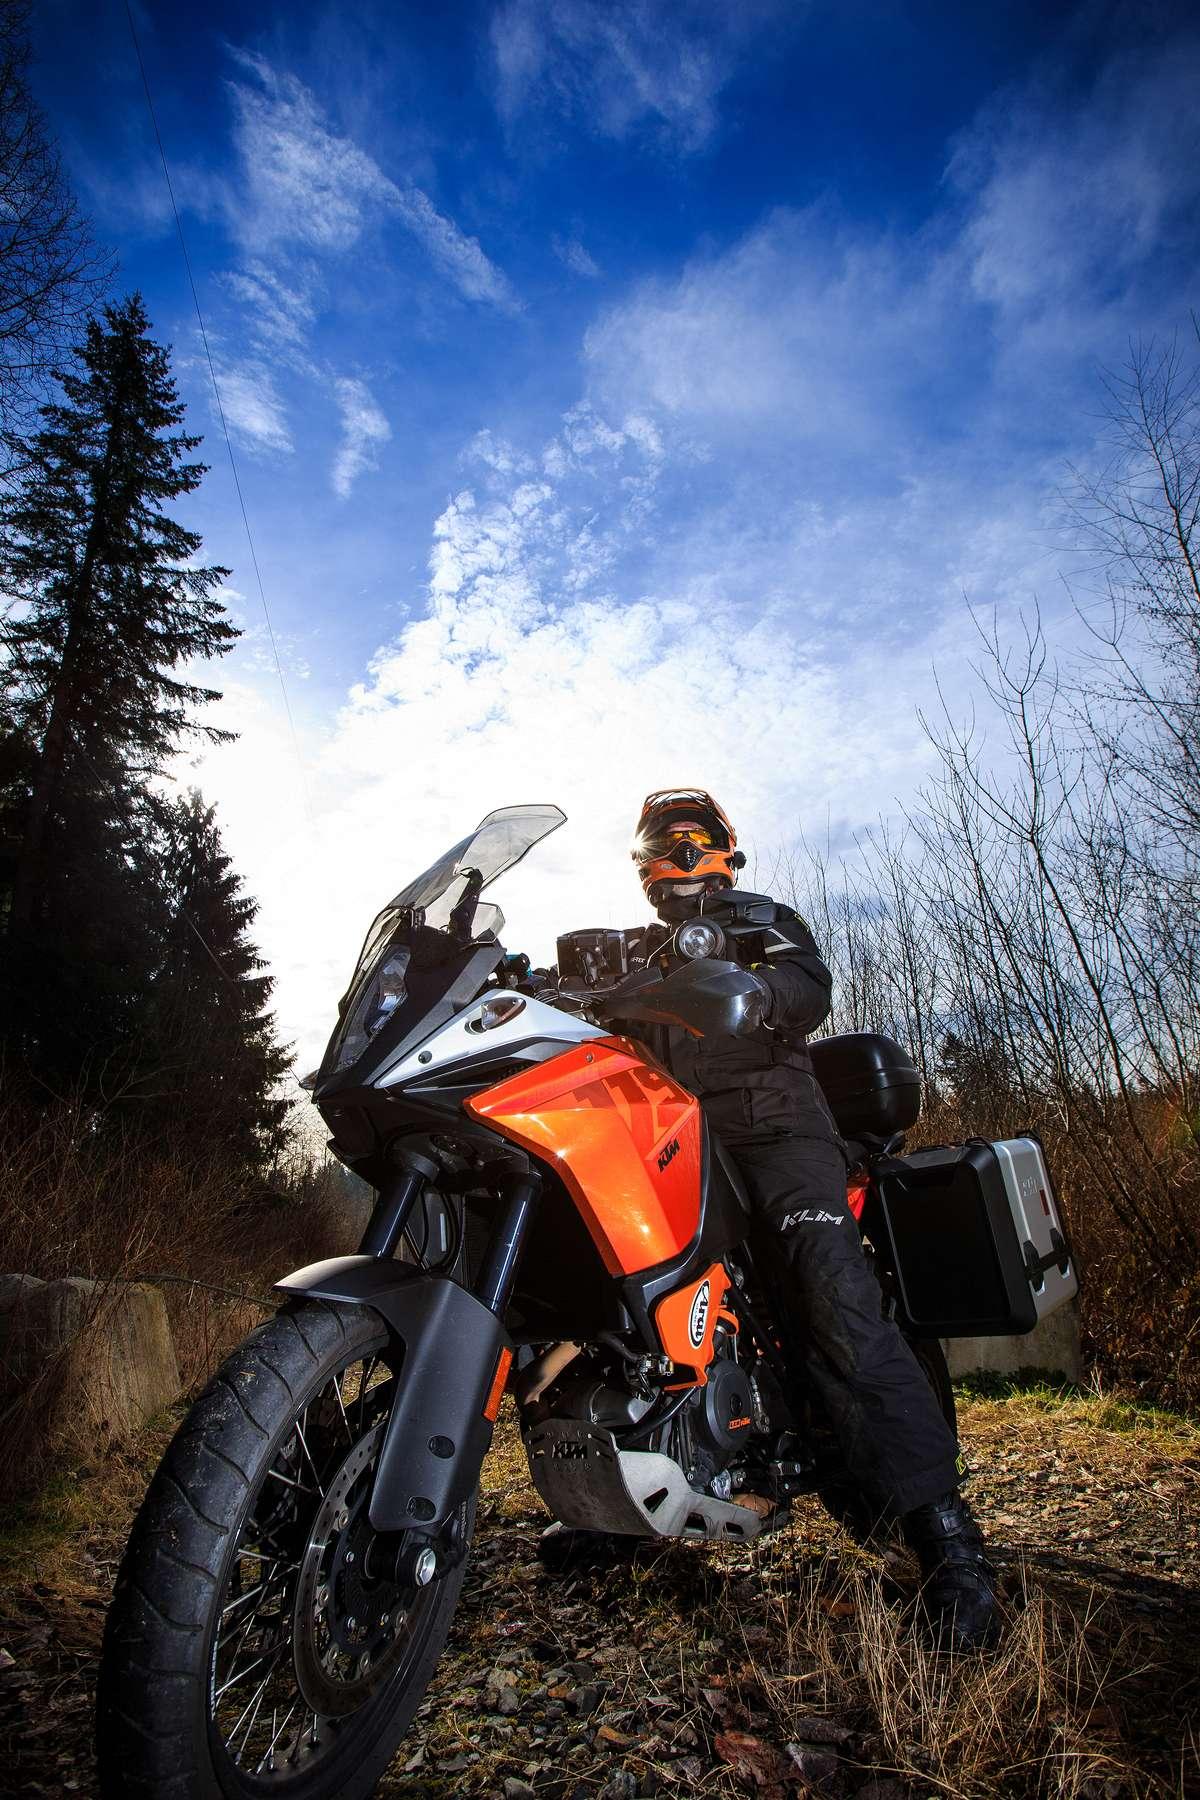 088-editorial-magazine-portraits-motorcyclist.jpg